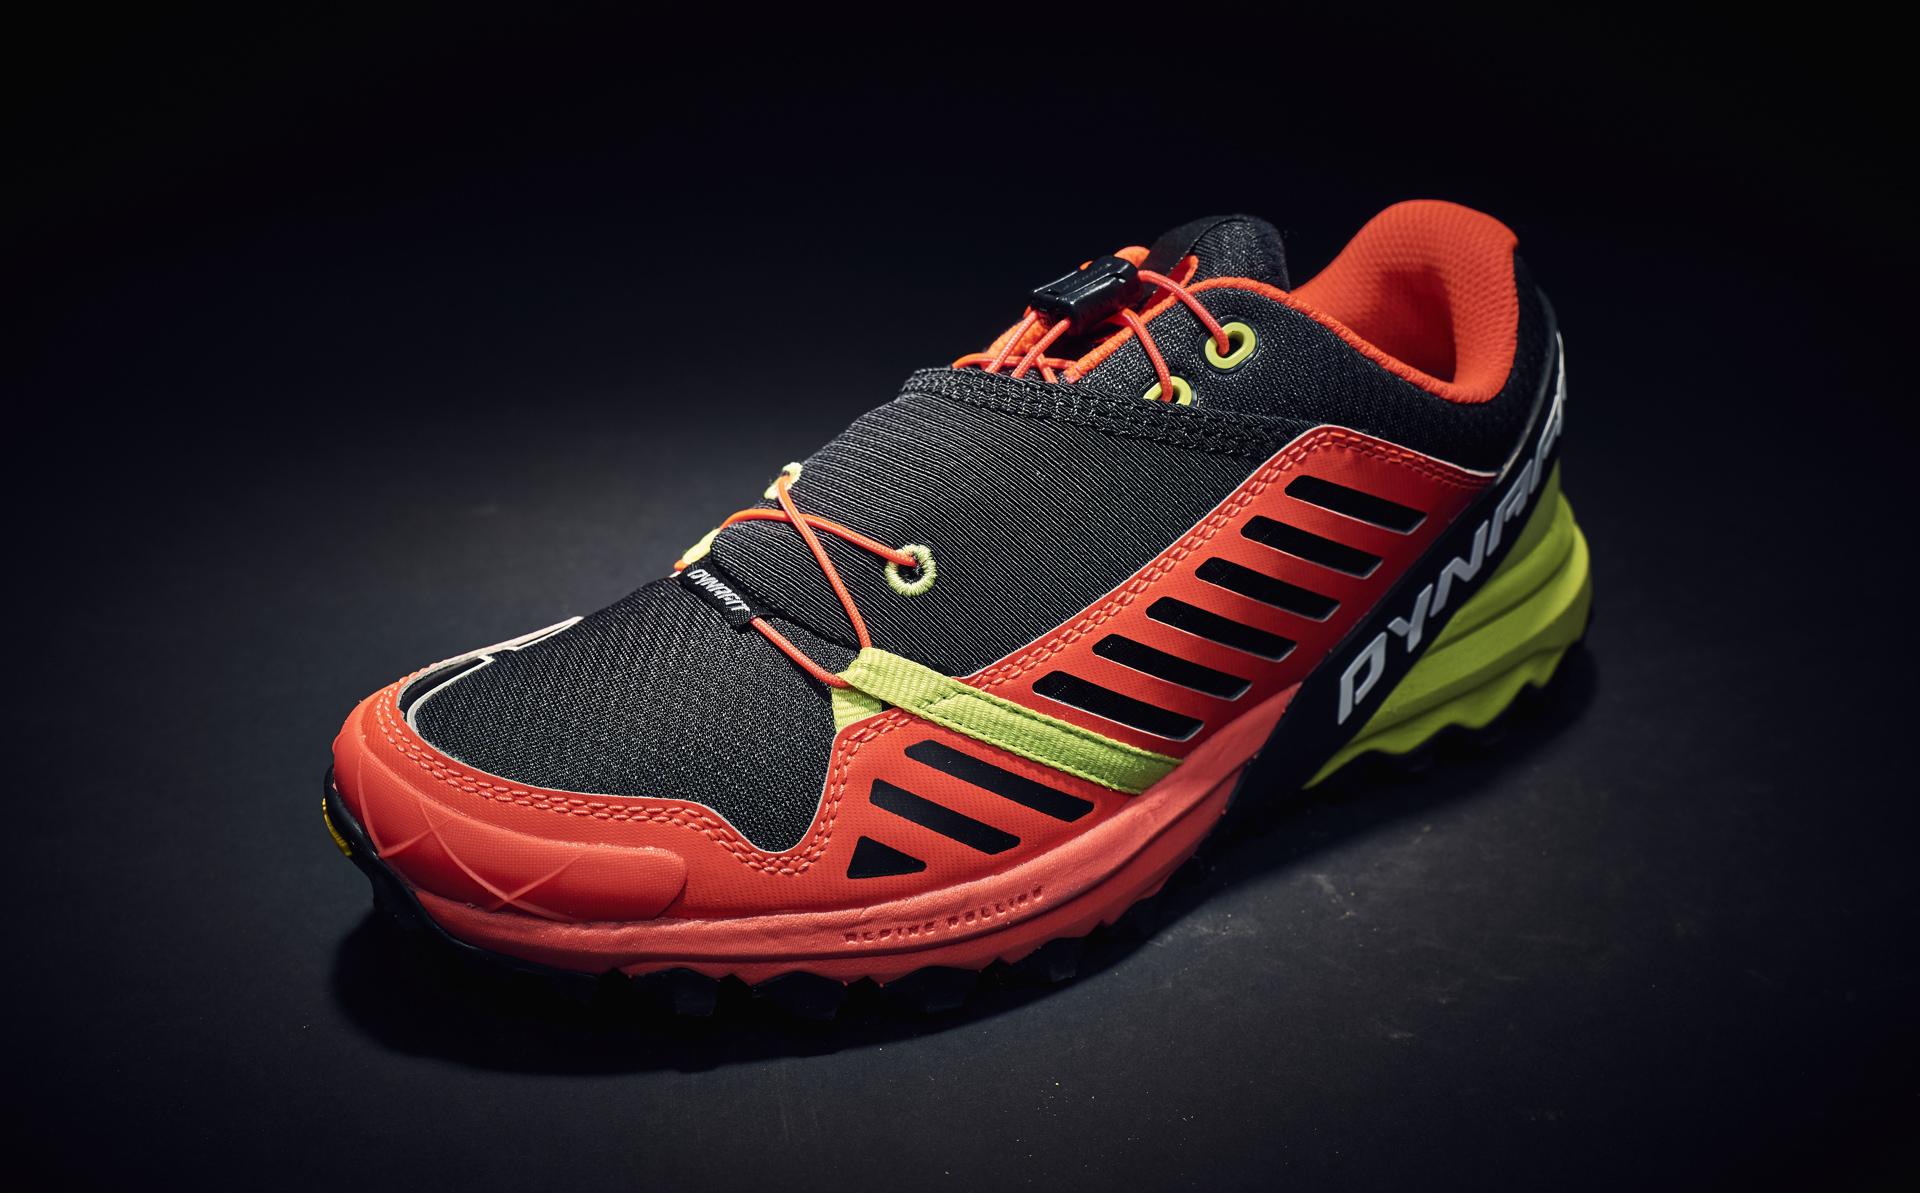 Dynafit Trailrunning Schuh Highlights 2017